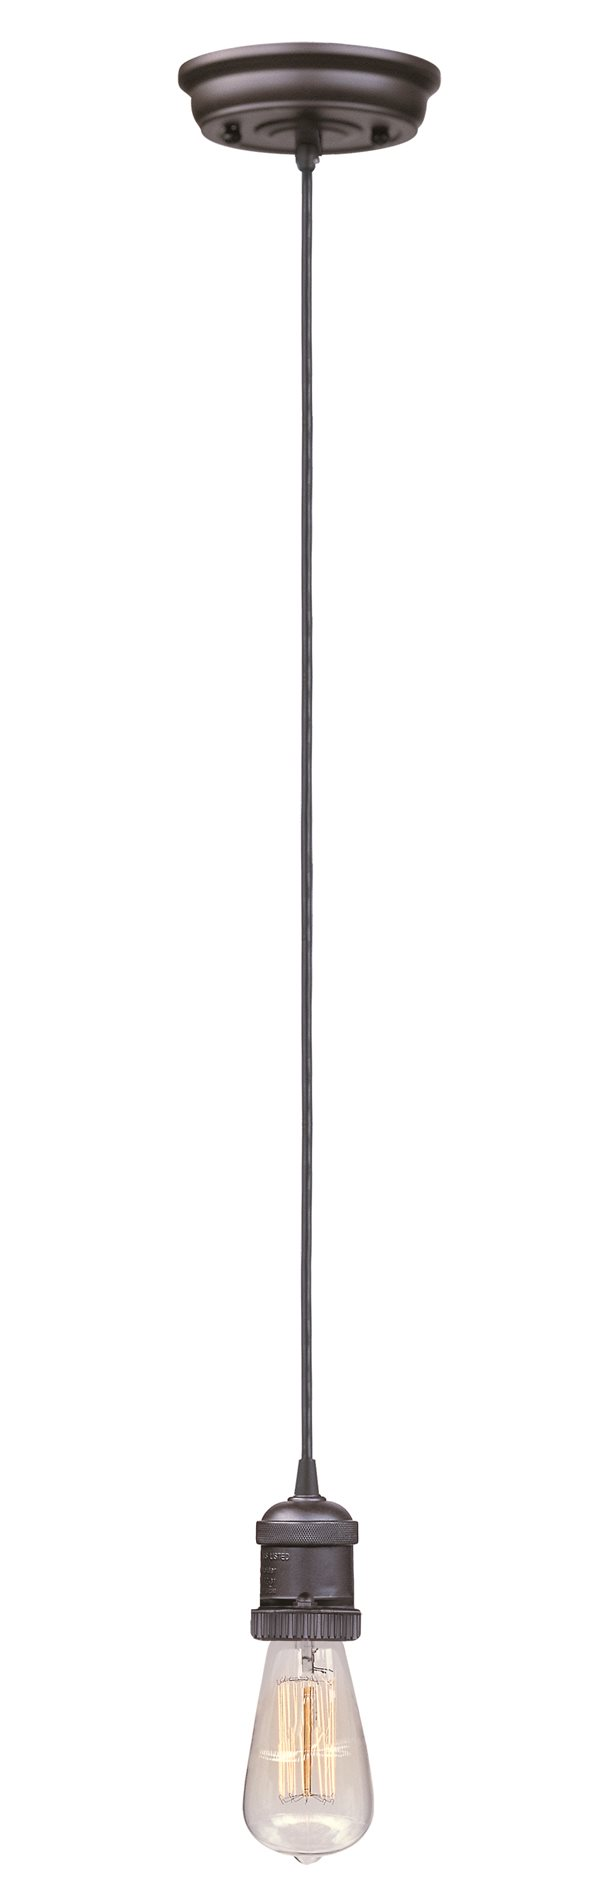 Maxim lighting 25018 mini hi bay mini hi bay 1 light pendant cord bz bronze bulb not included arubaitofo Image collections